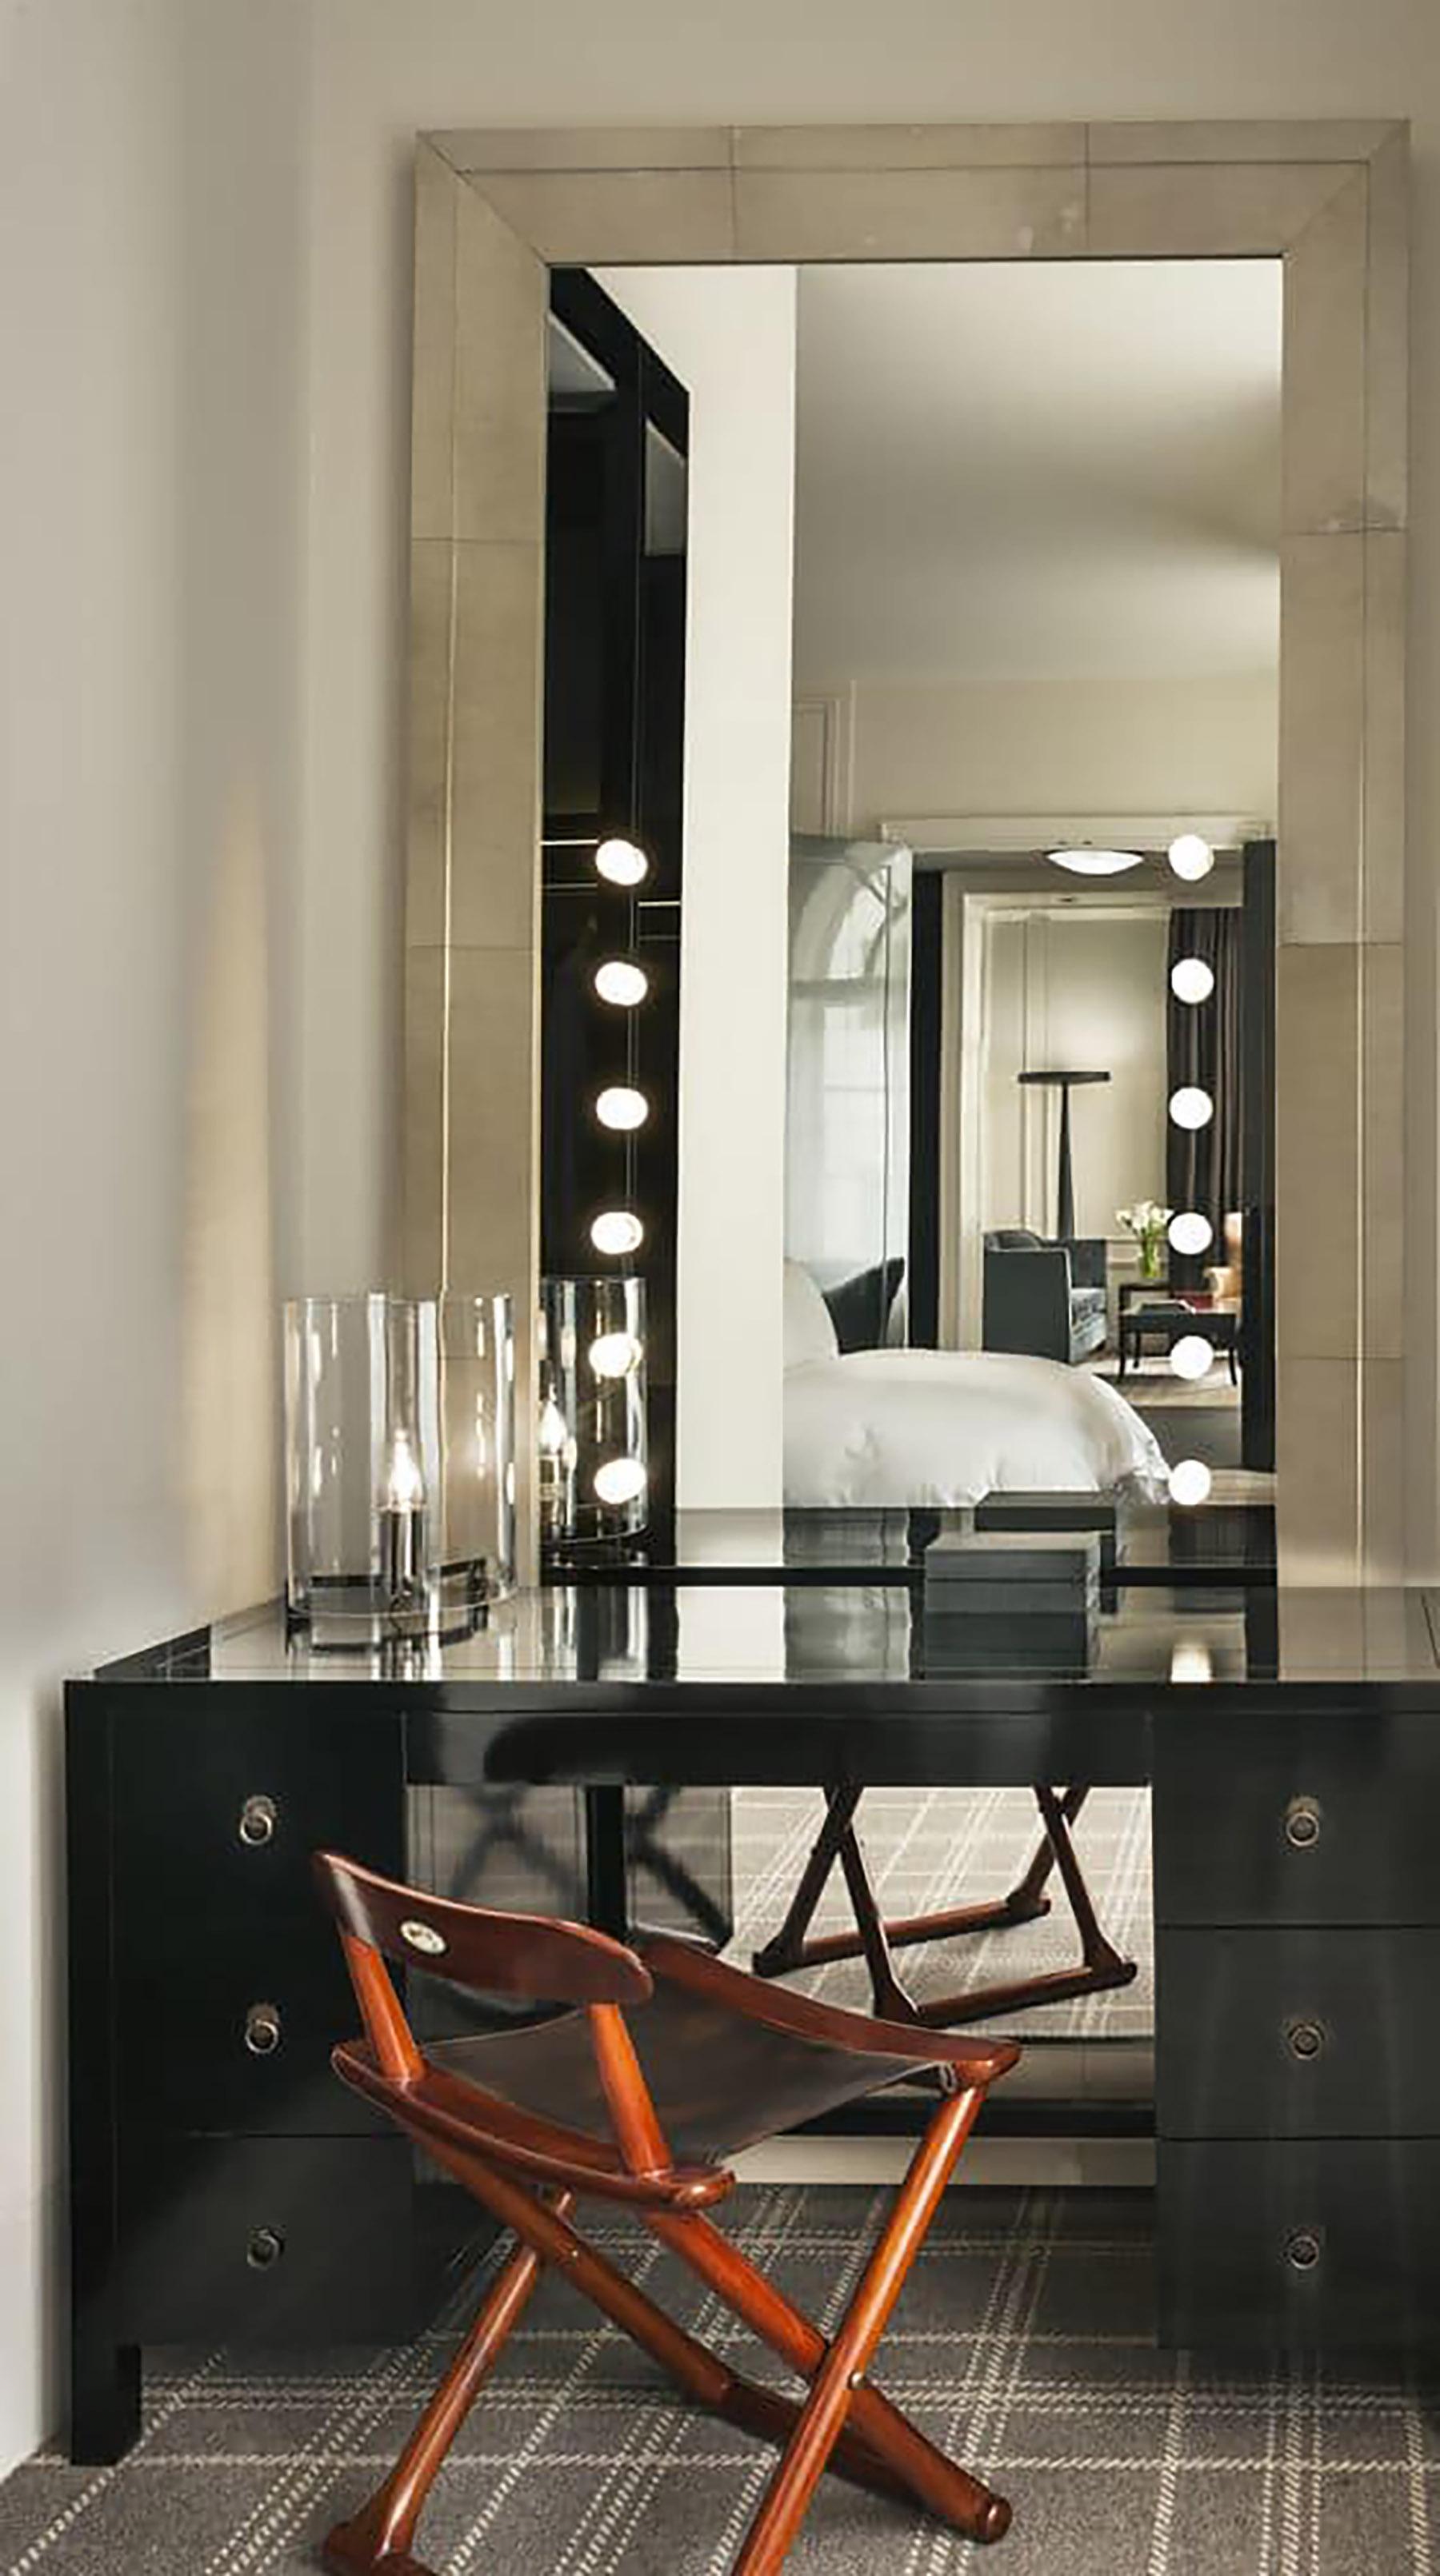 ....bespoke furniture   rosewood london : dressing table..特别定制家具   瑰丽伦敦酒店:梳妆台....